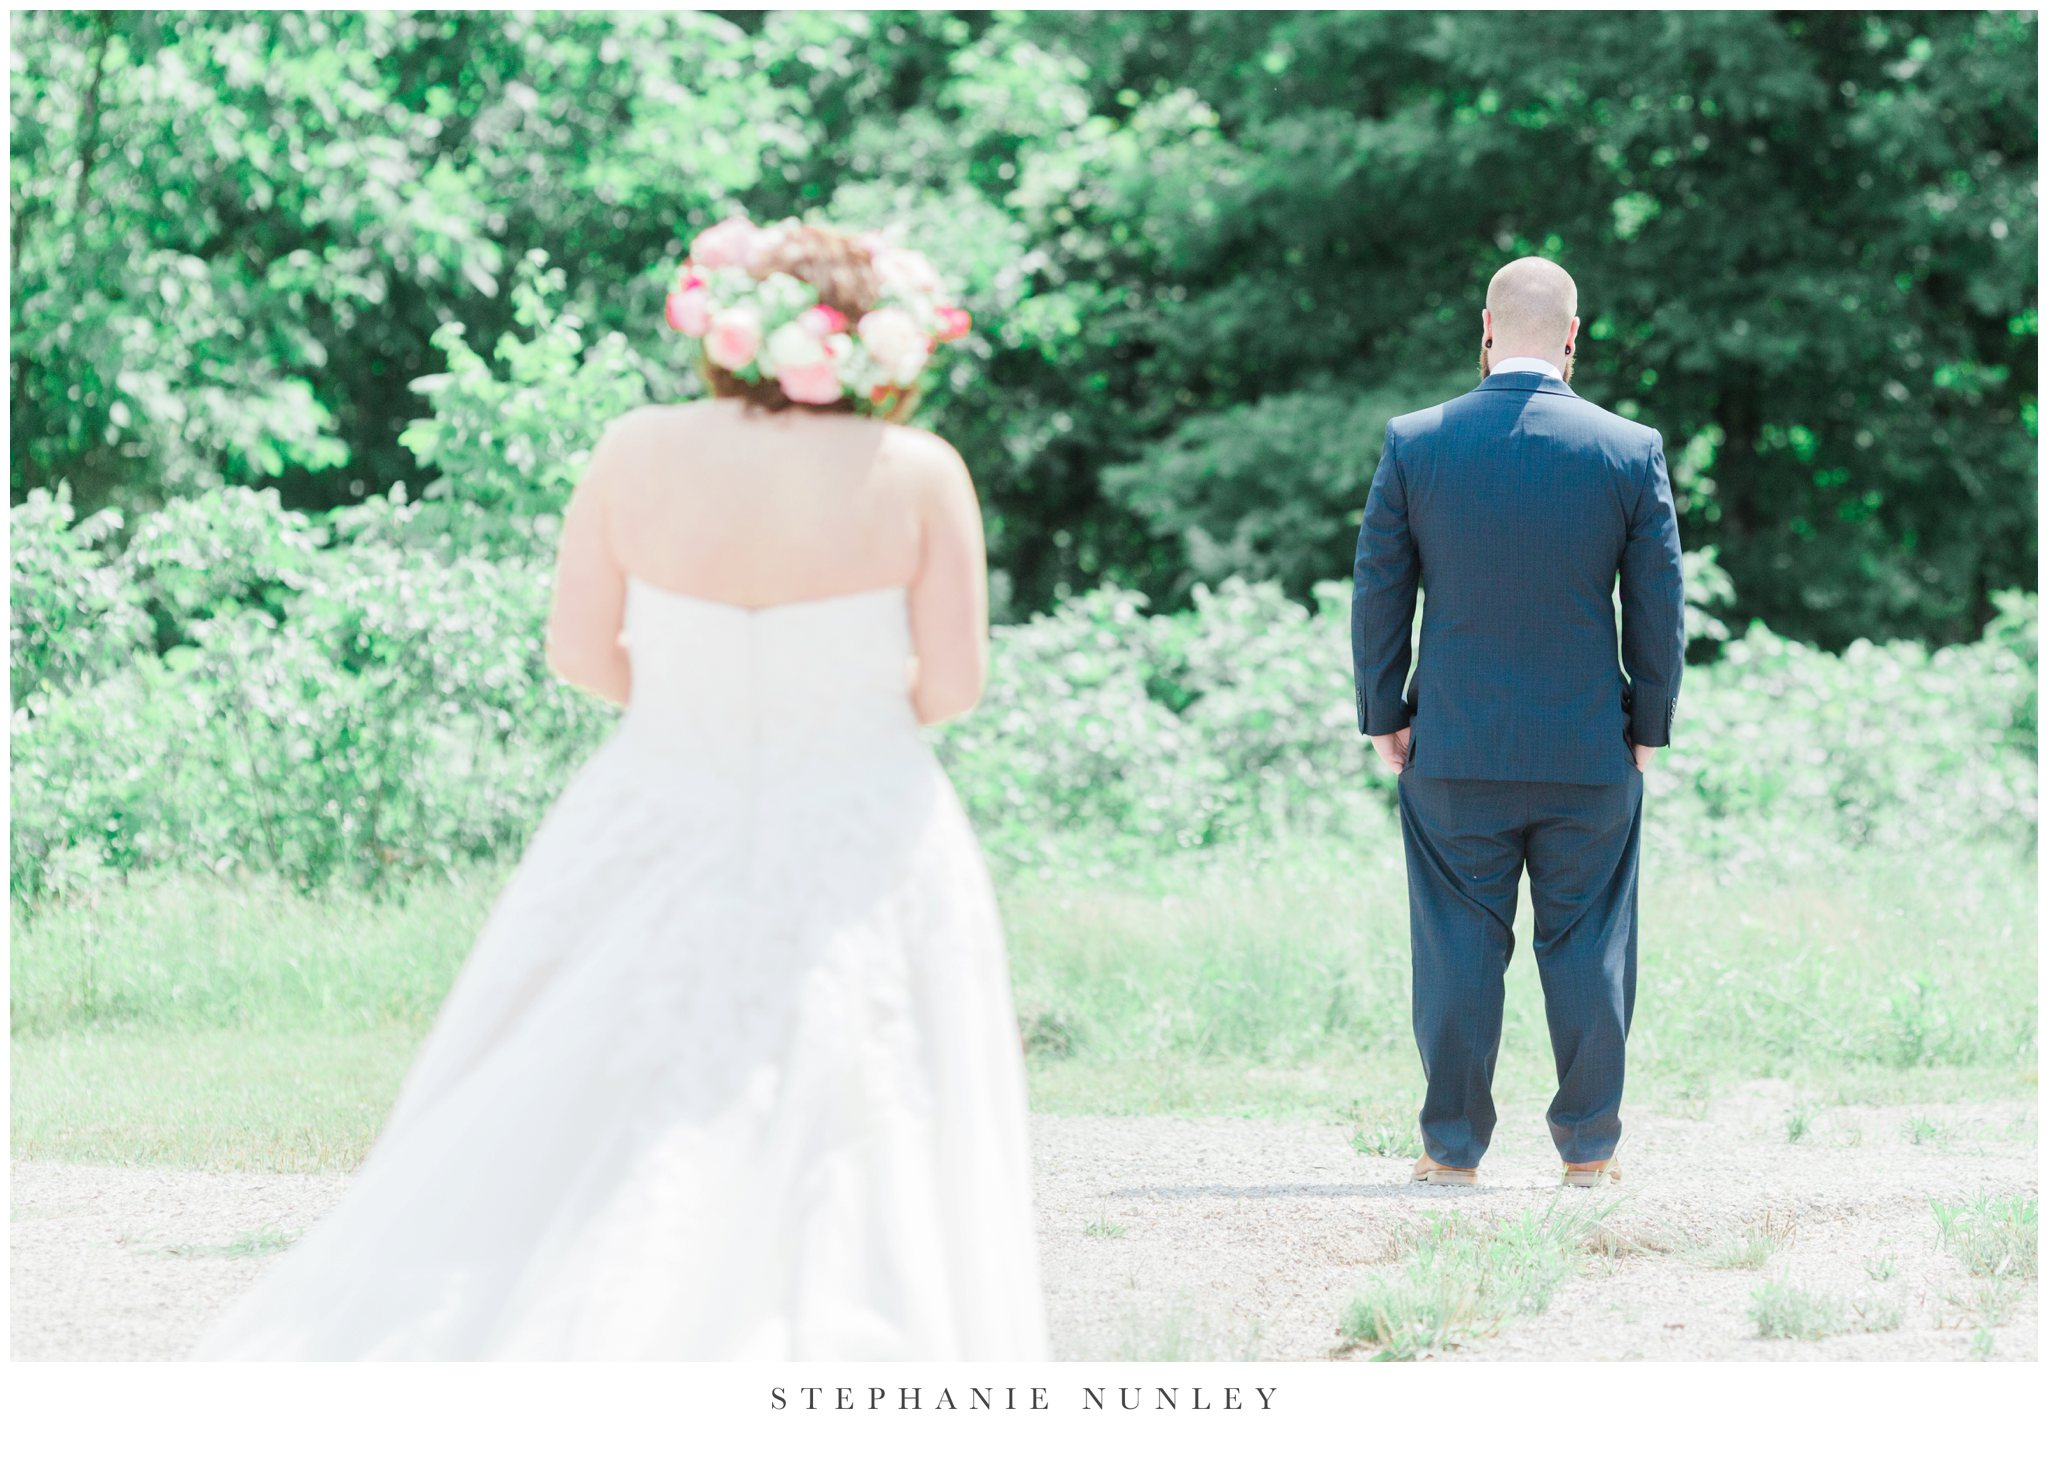 romantic-outdoor-wedding-with-flower-crown-0027.jpg